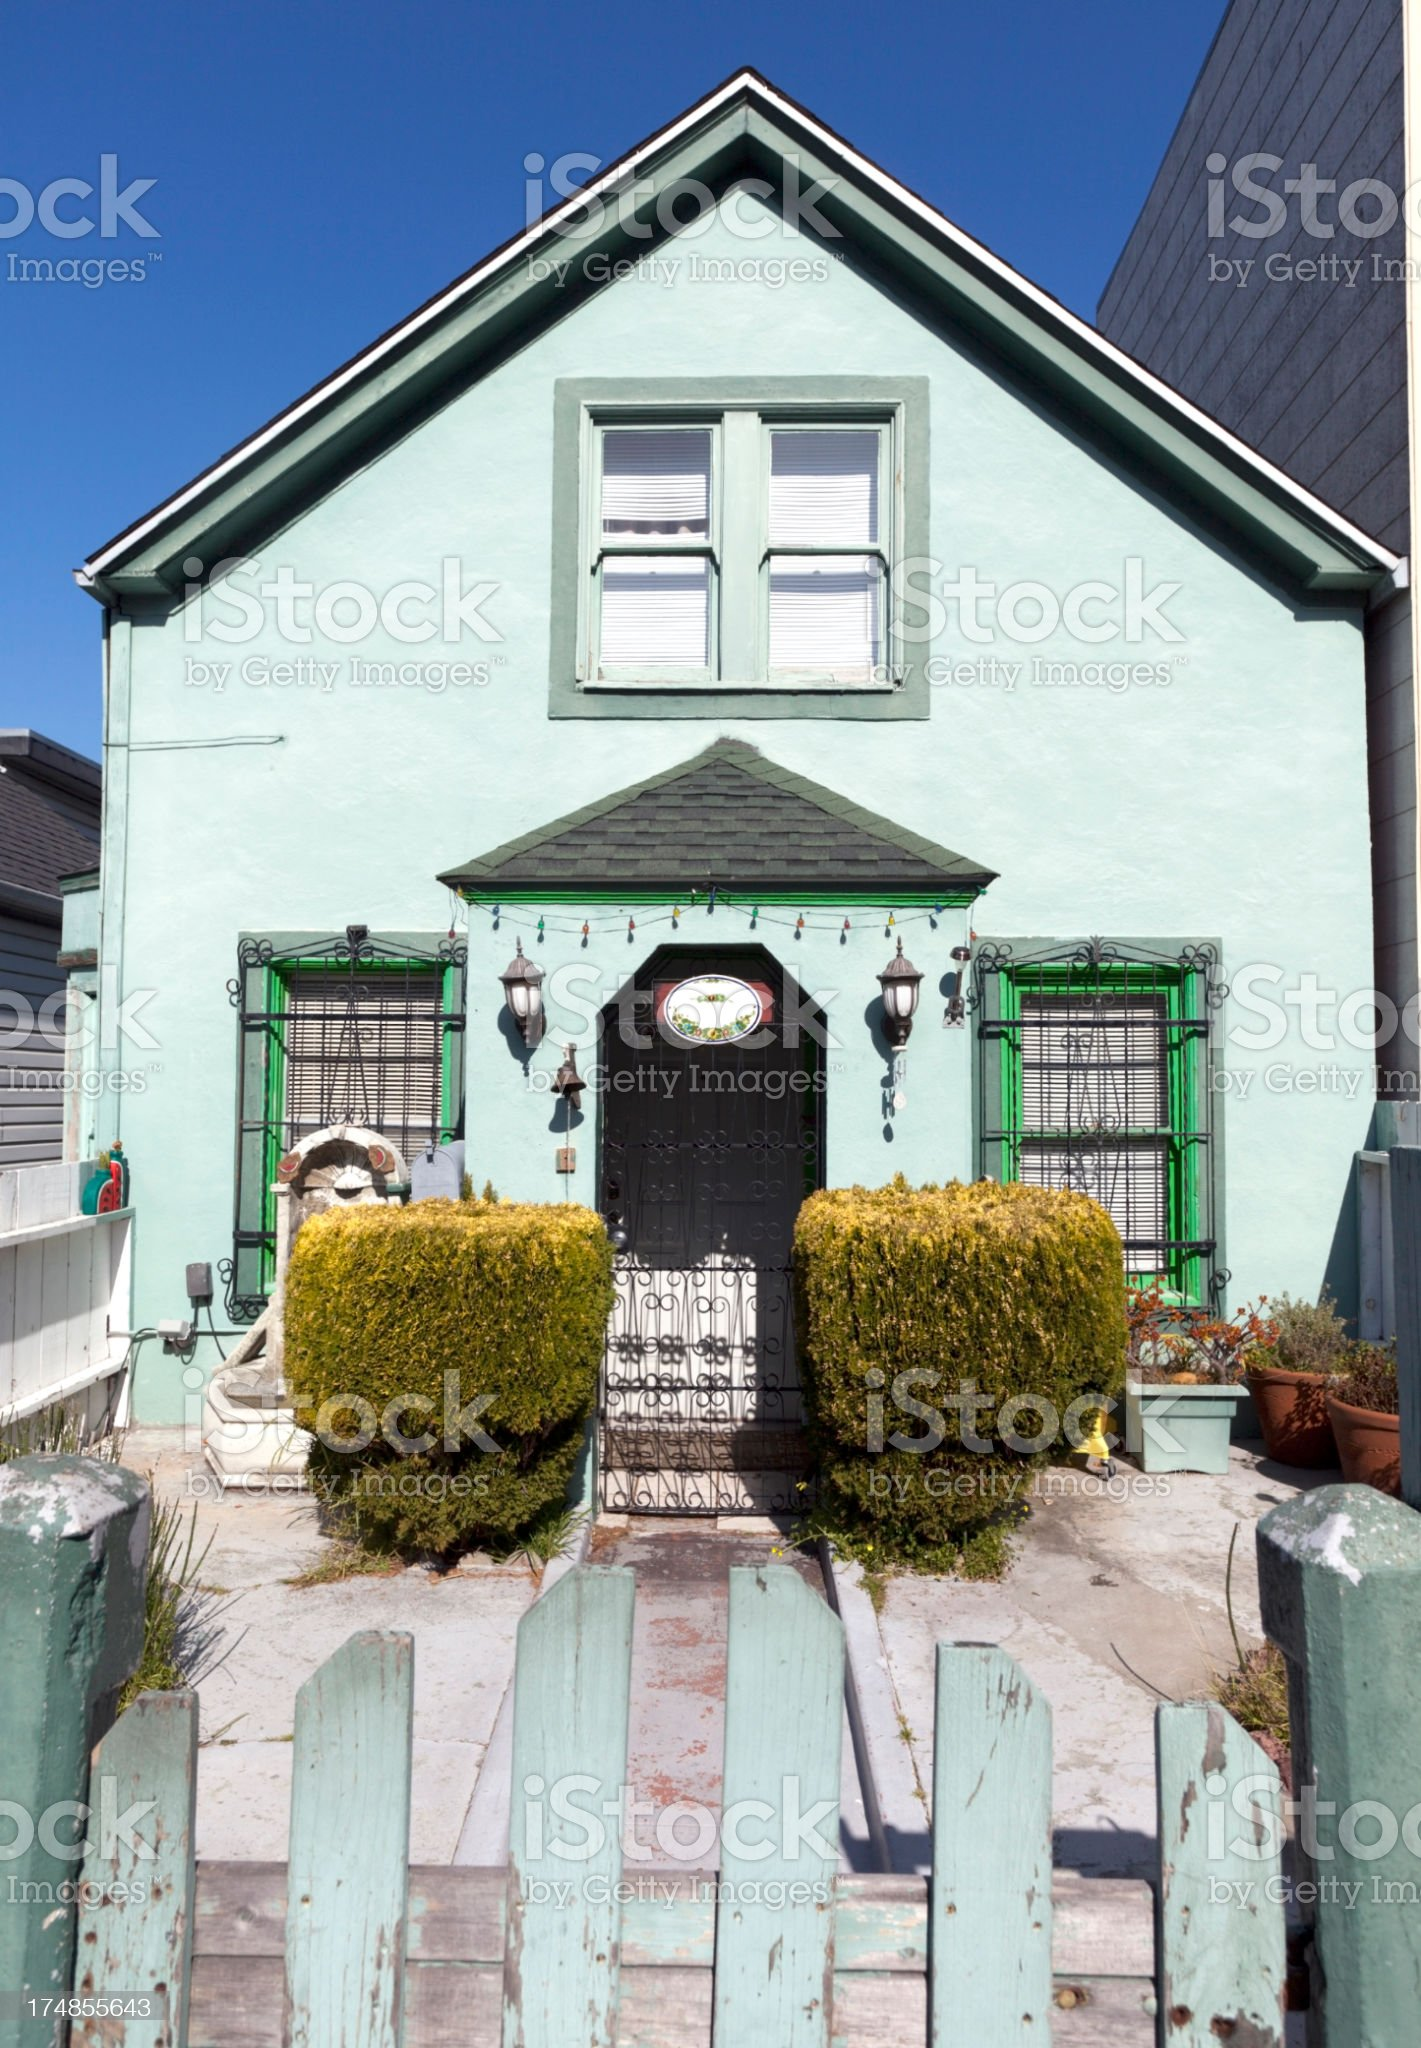 Symmetrical Home royalty-free stock photo